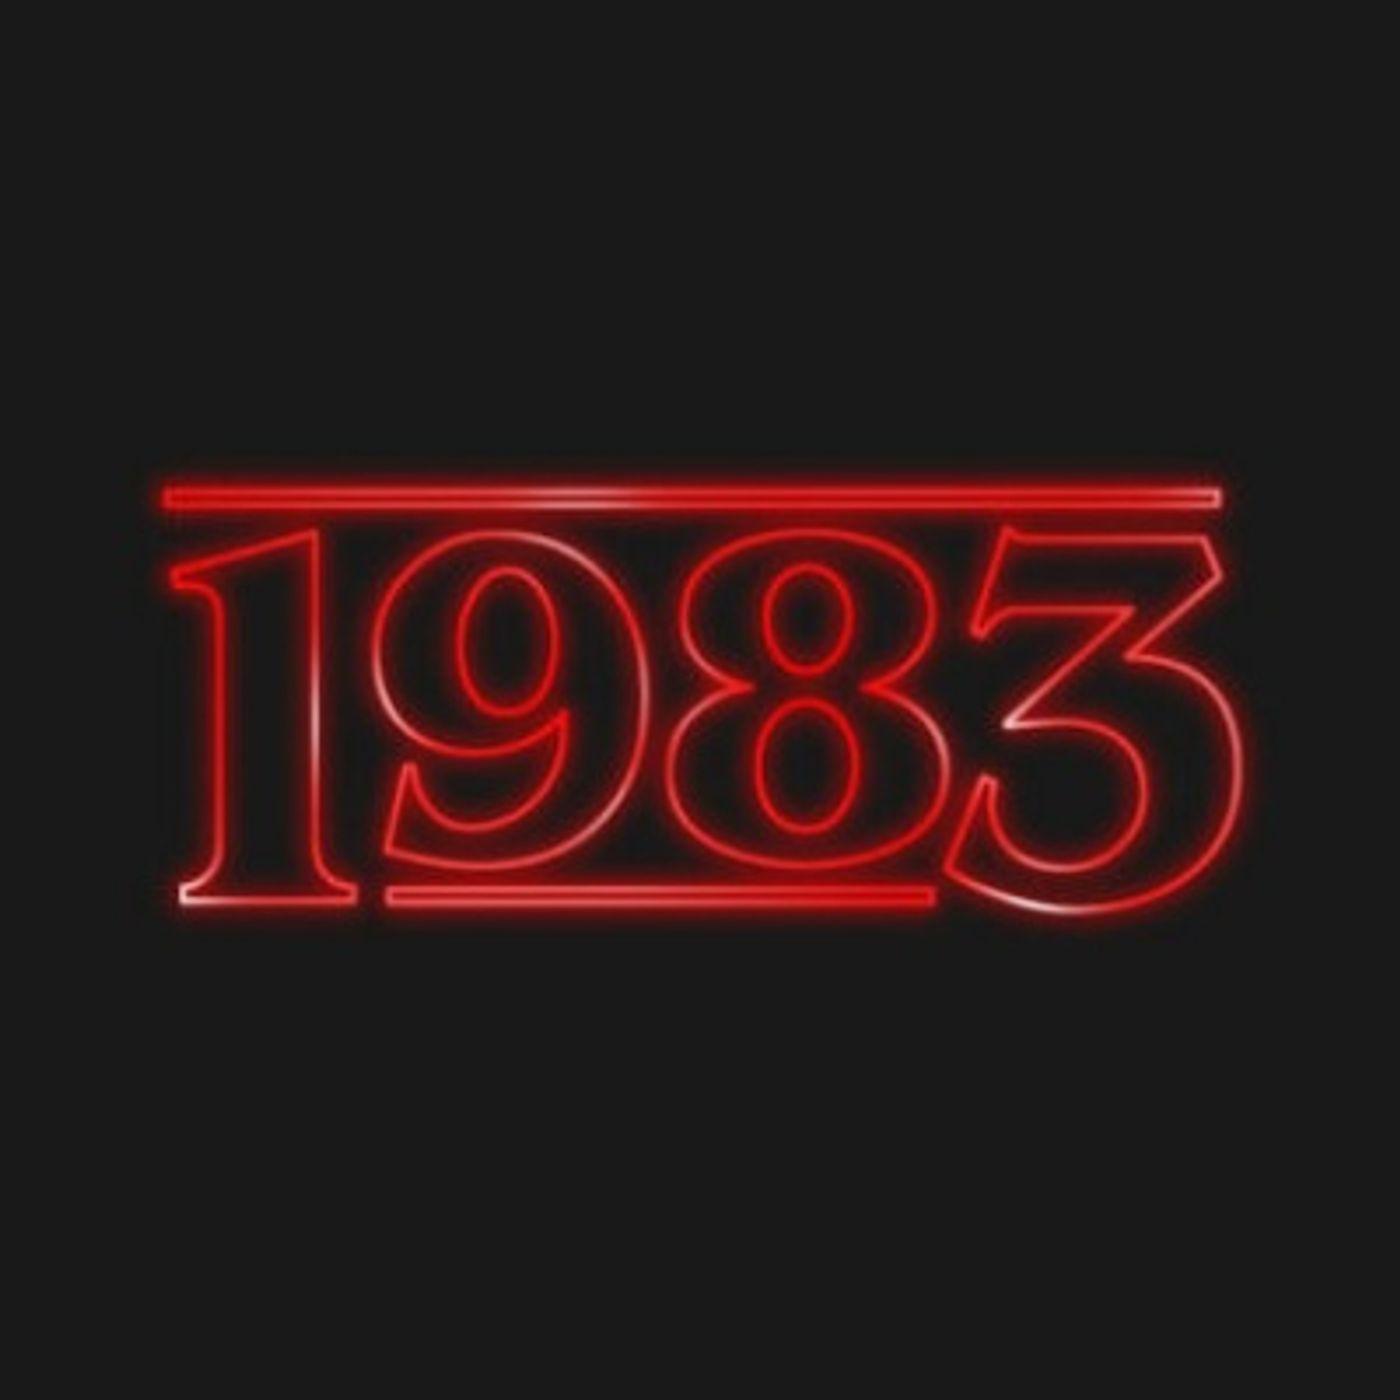 Reelin' Aug 11th, 1983